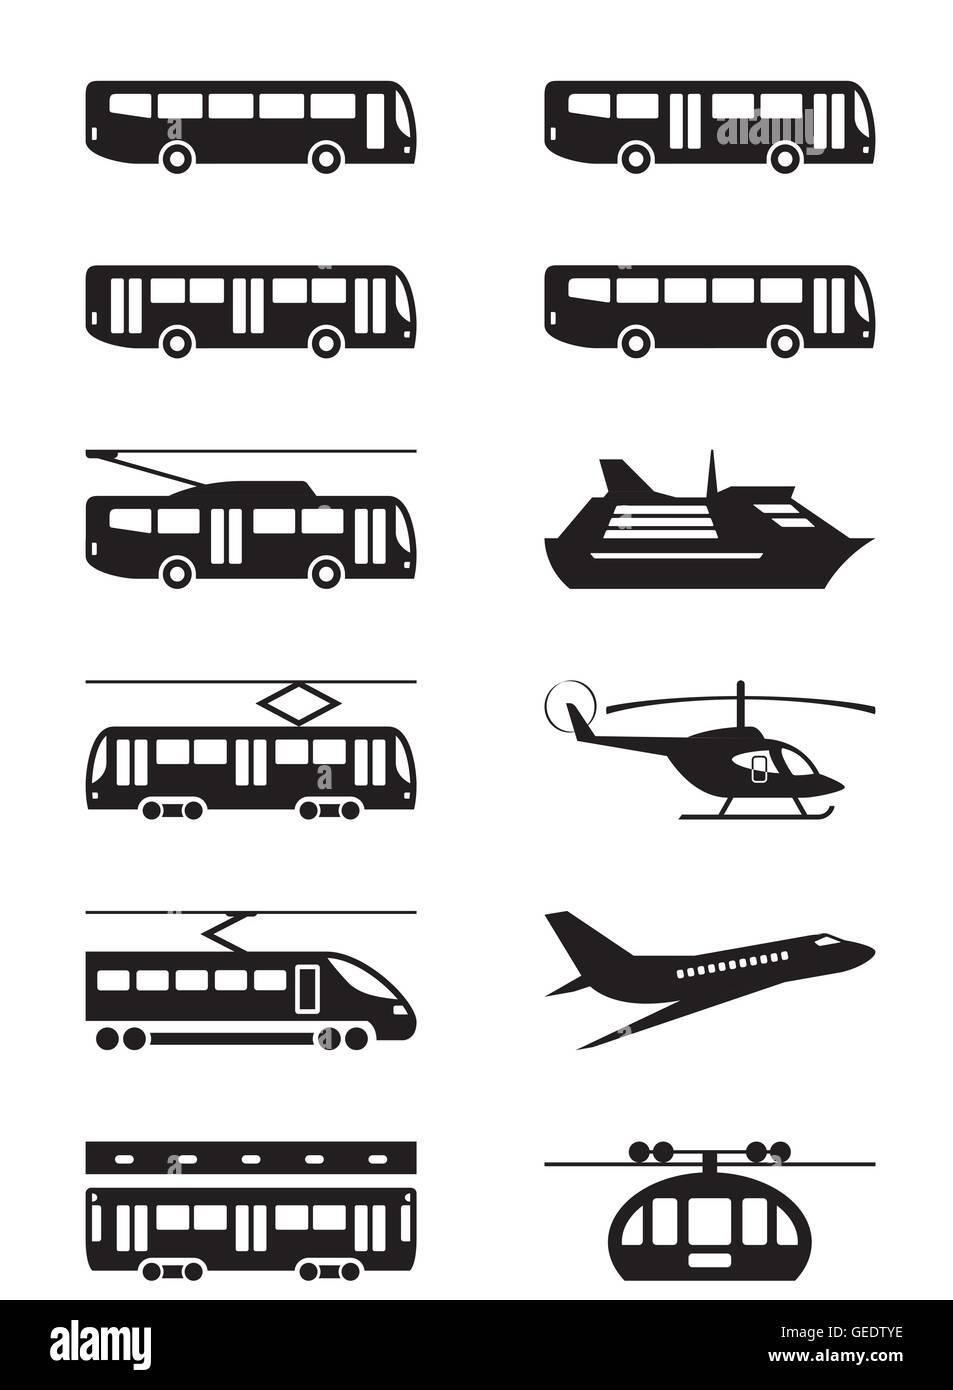 Passenger transportation vehicles - vector illustration - Stock Image